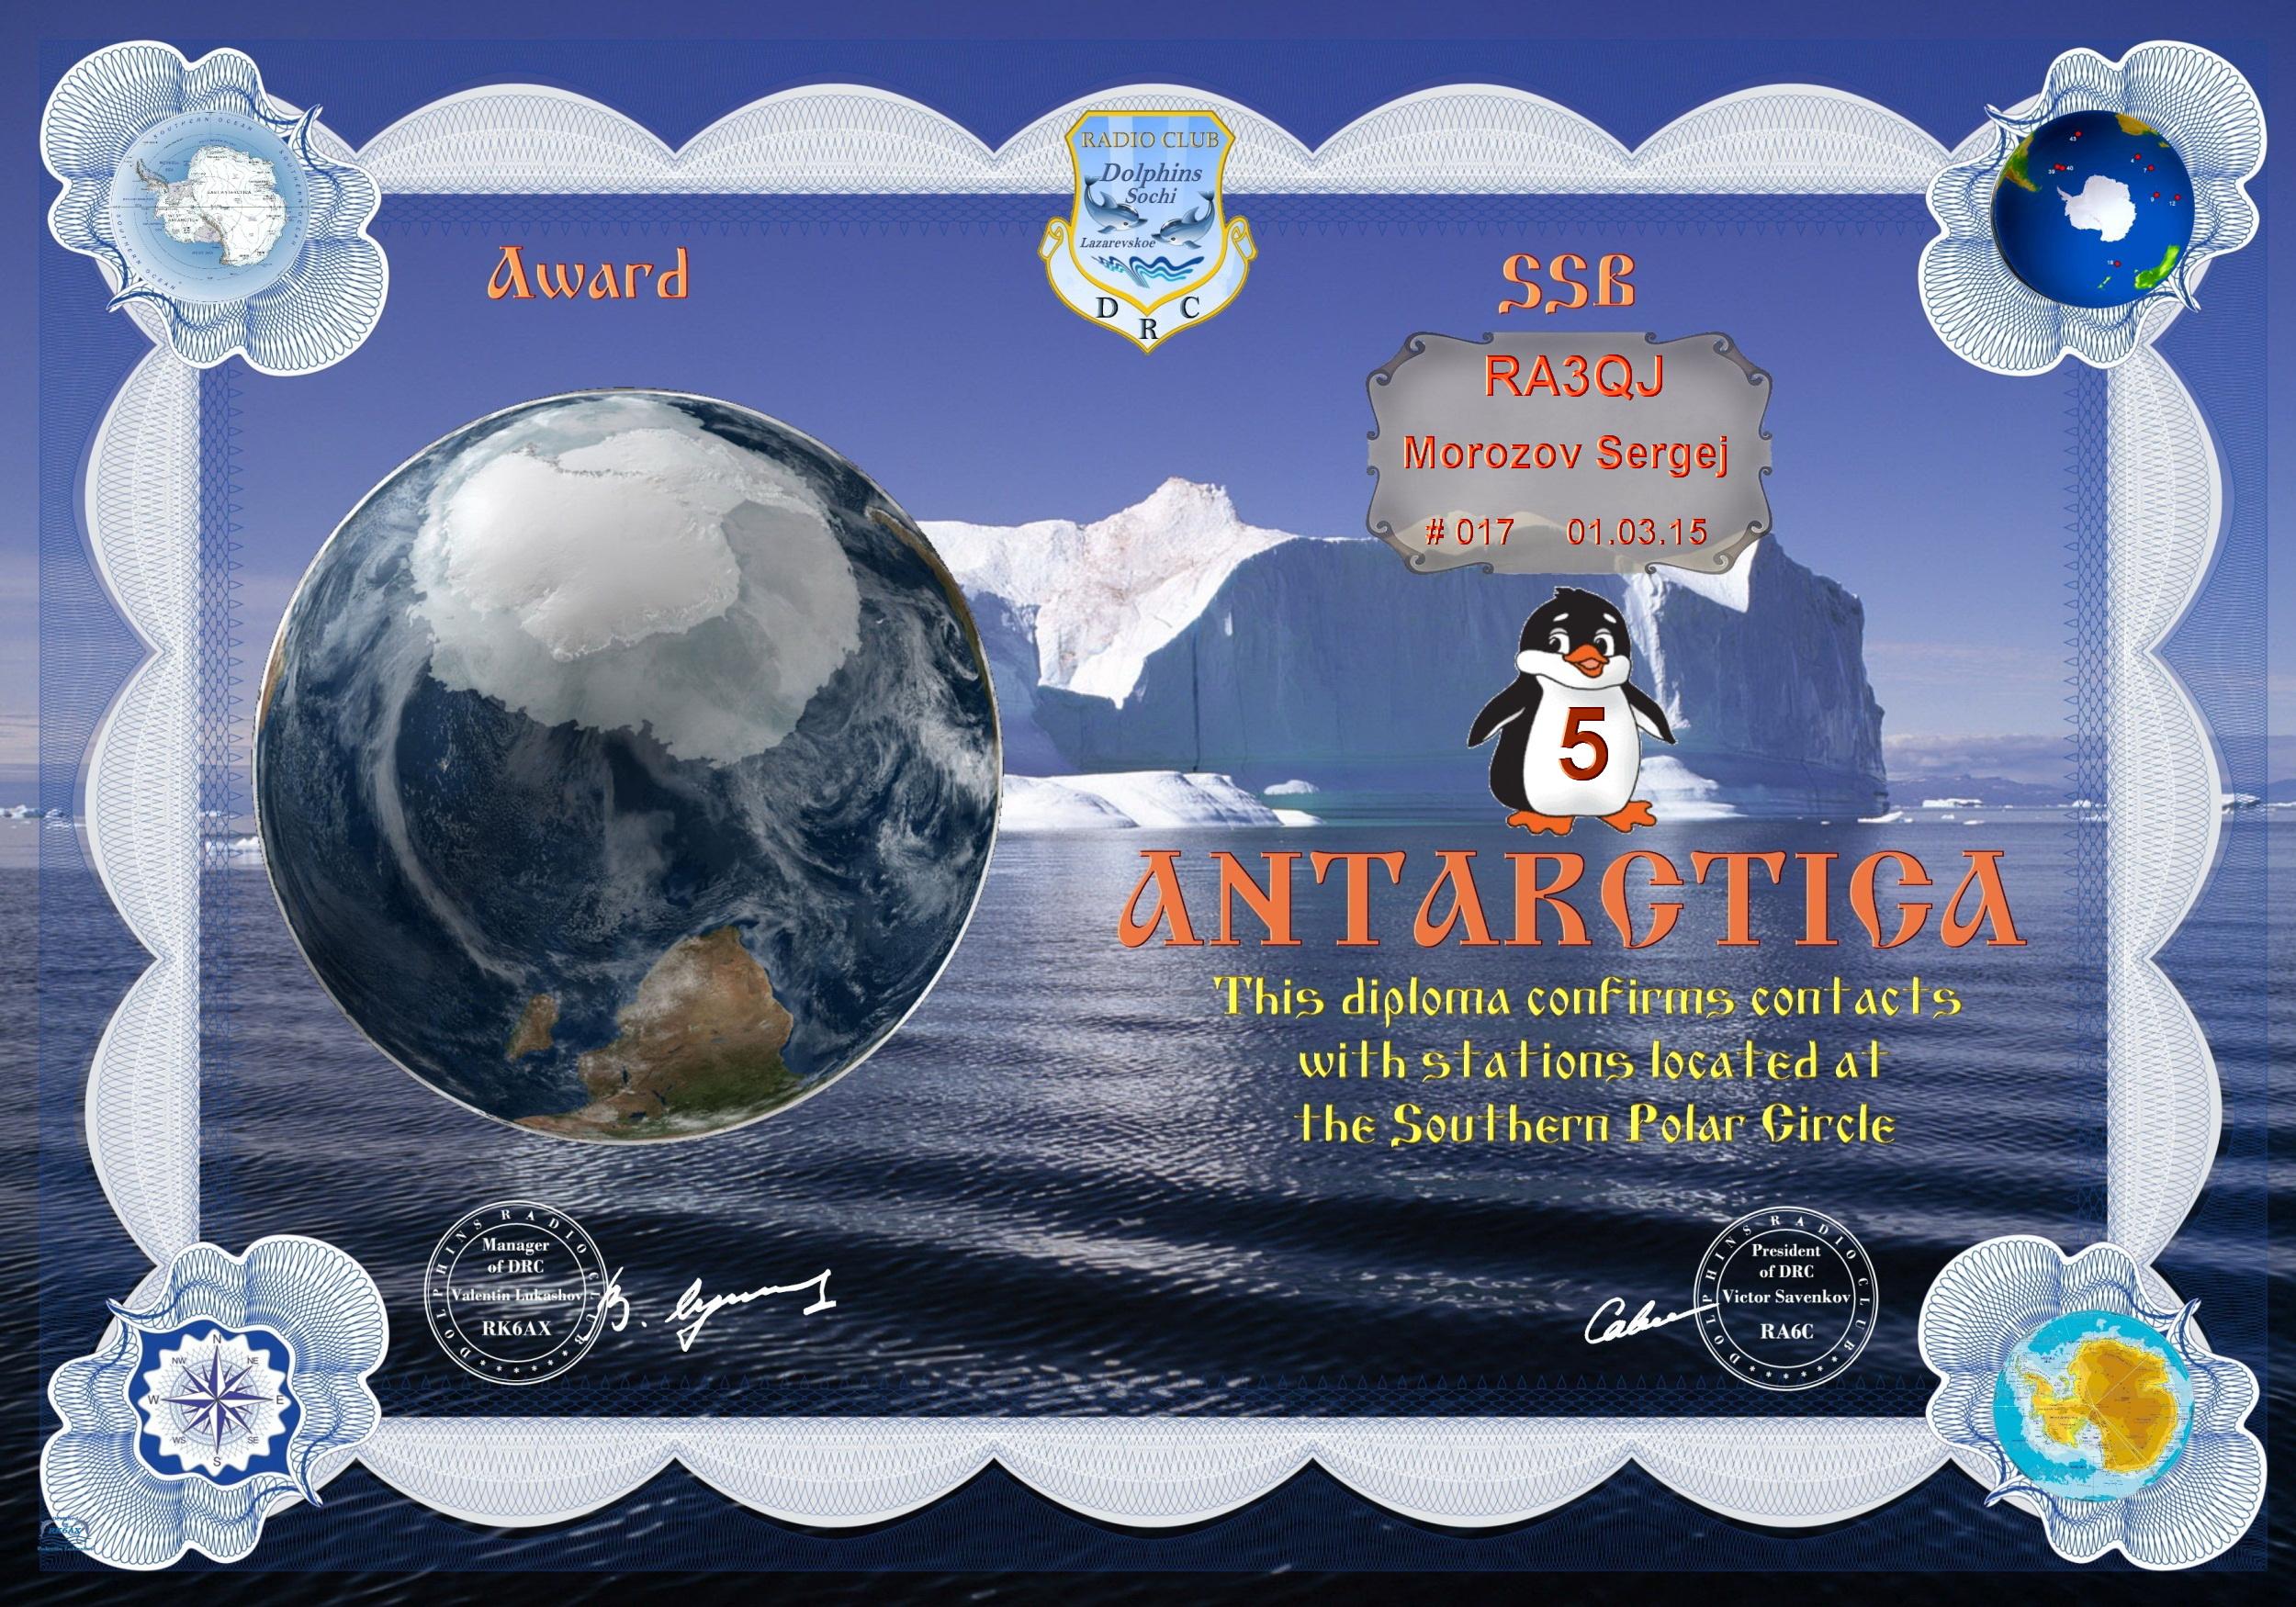 Нажмите на изображение для увеличения.  Название:Антарктида 5 SSB.jpg Просмотров:69 Размер:1.59 Мб ID:135424